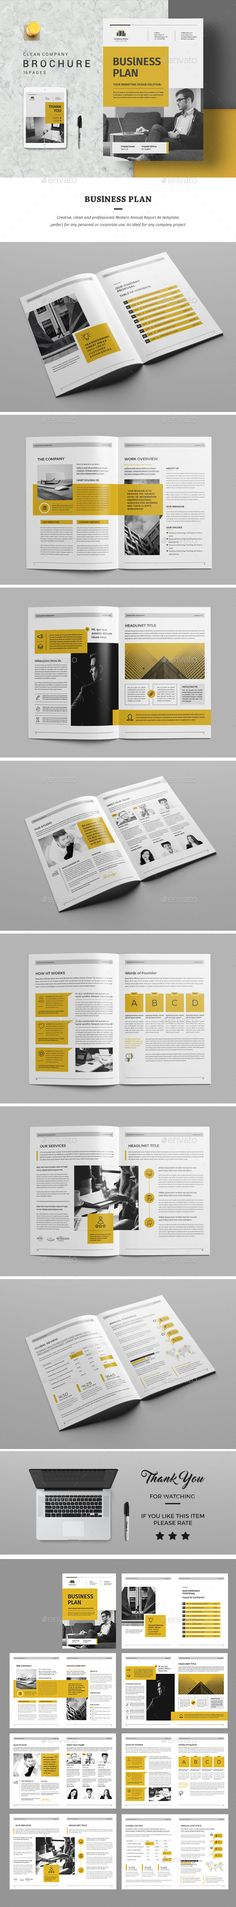 Business Plan — InDesign INDD #elegant #design • Download ➝ https://graphicriver.net/item/business-plan/19521662?ref=pxcr